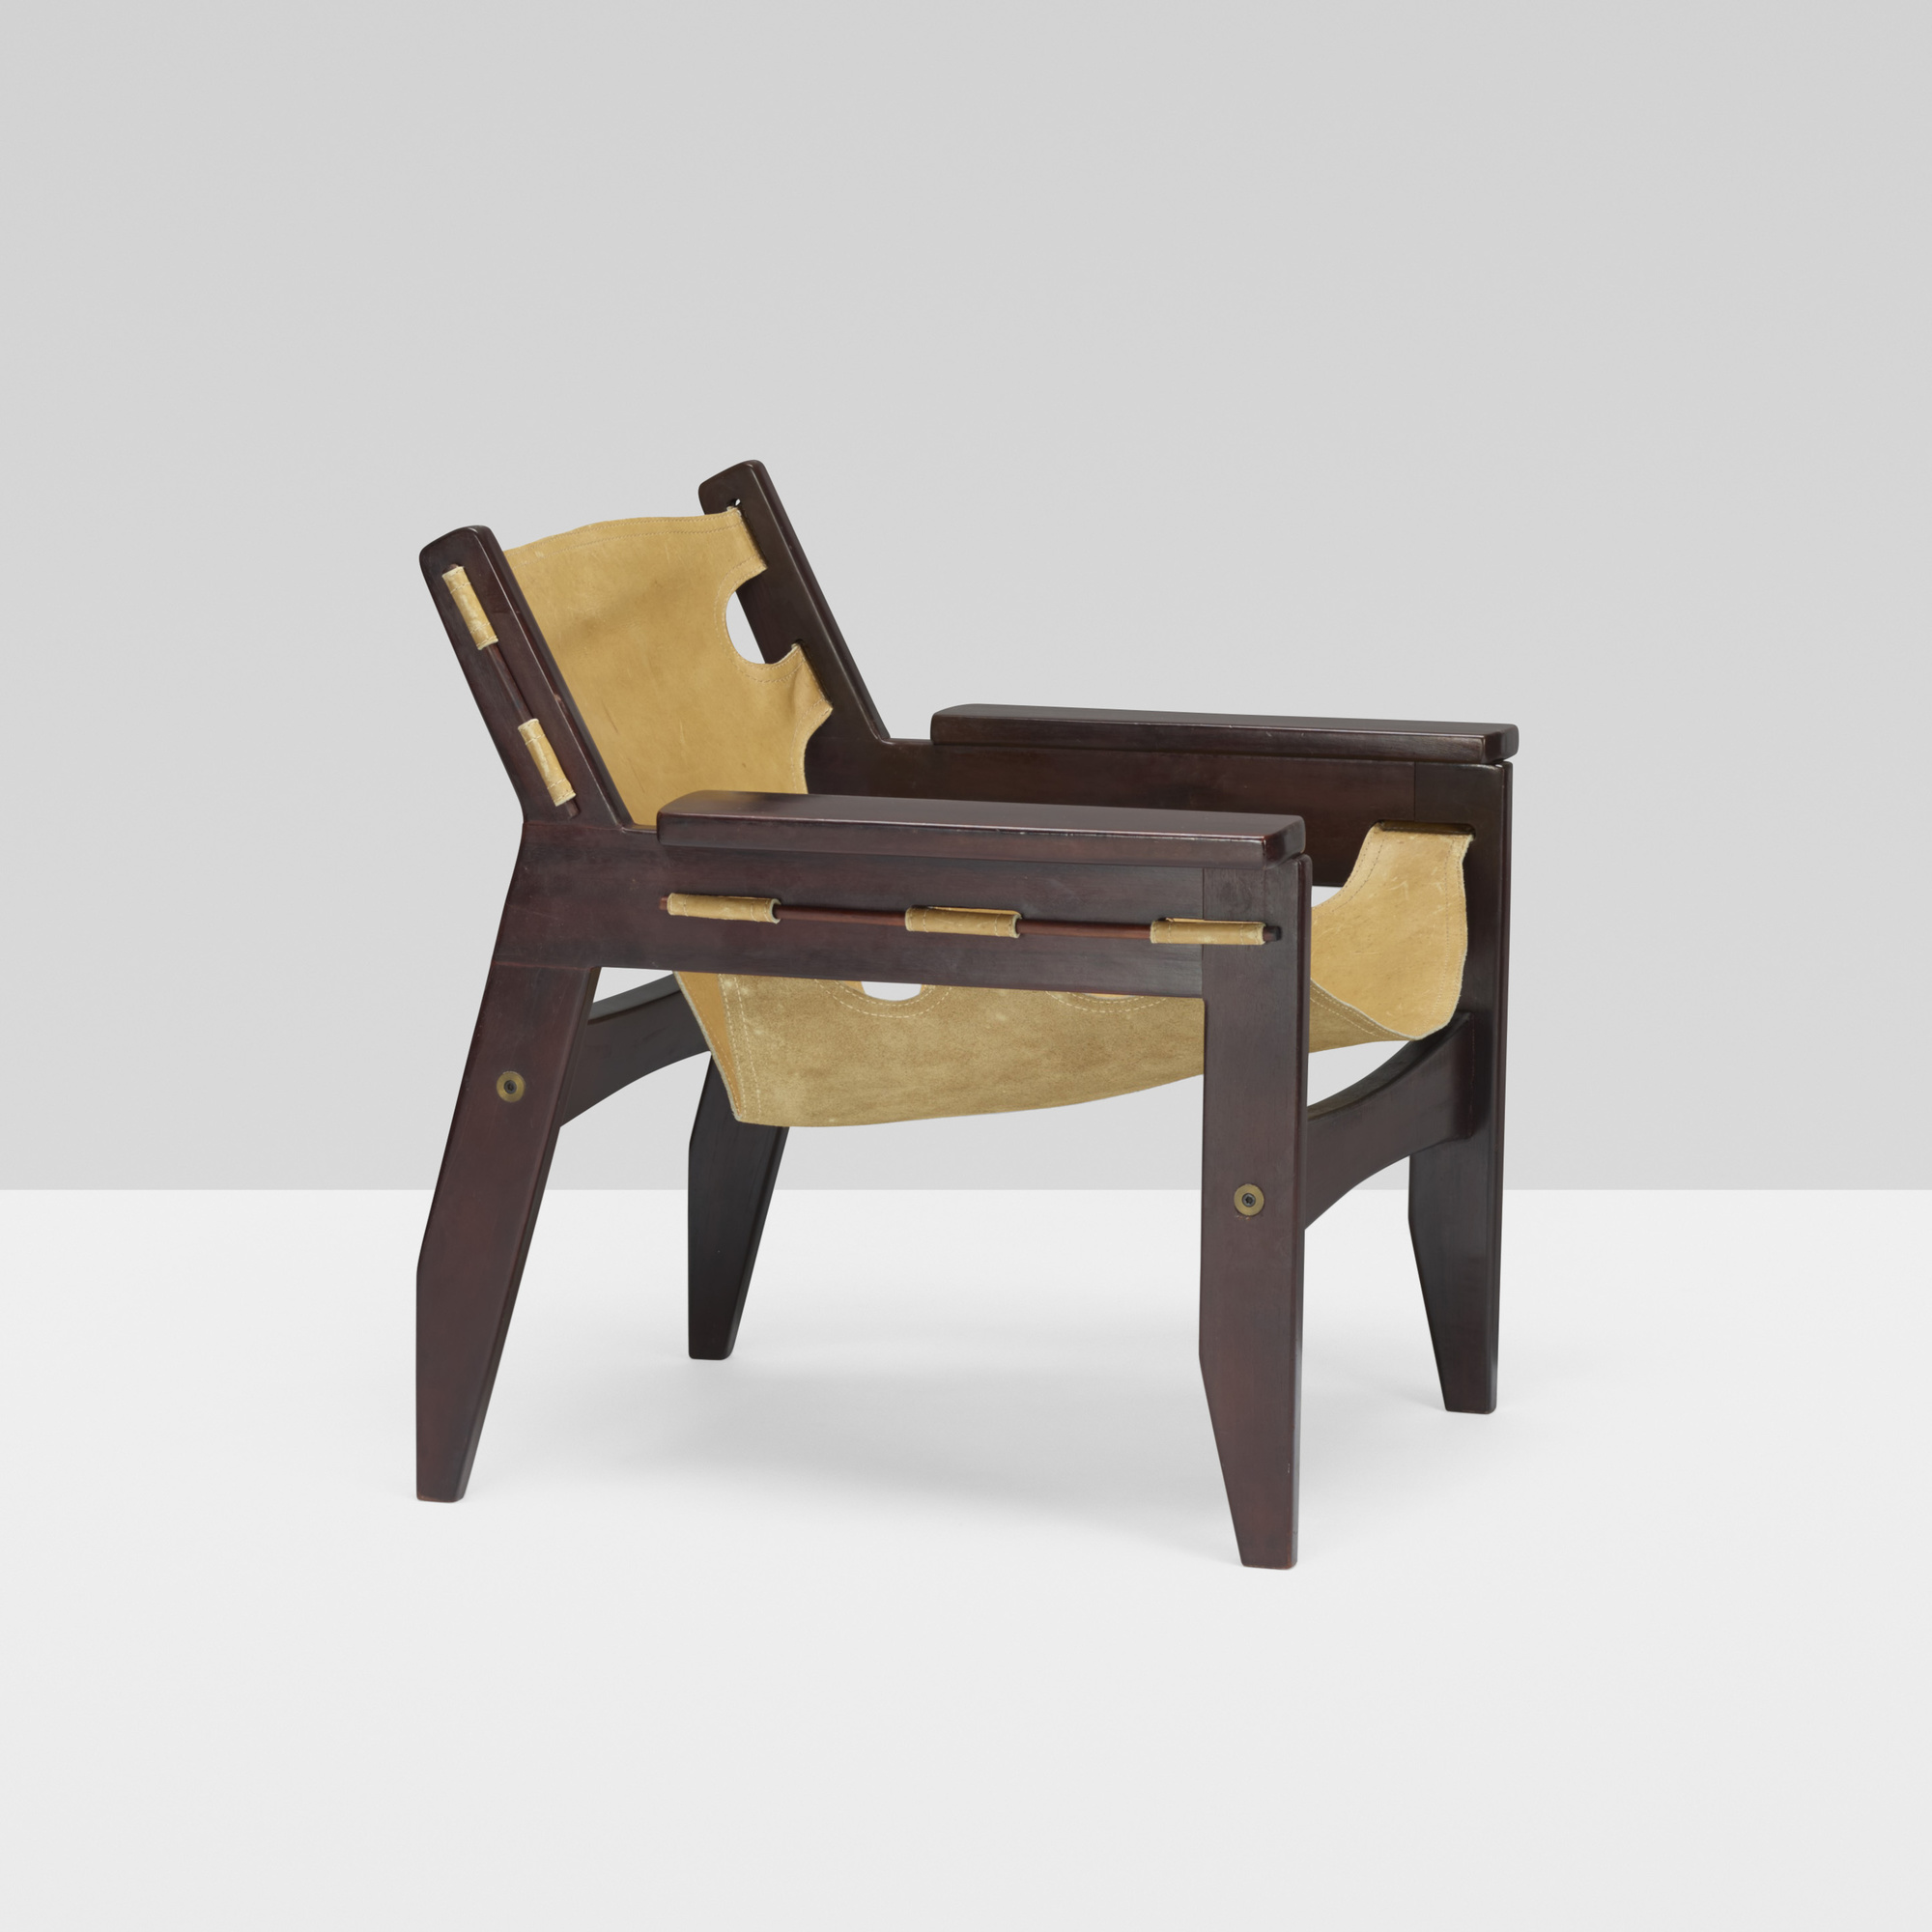 Charmant ... 182: Sergio Rodrigues / Kilin Light Chair (2 Of 4)